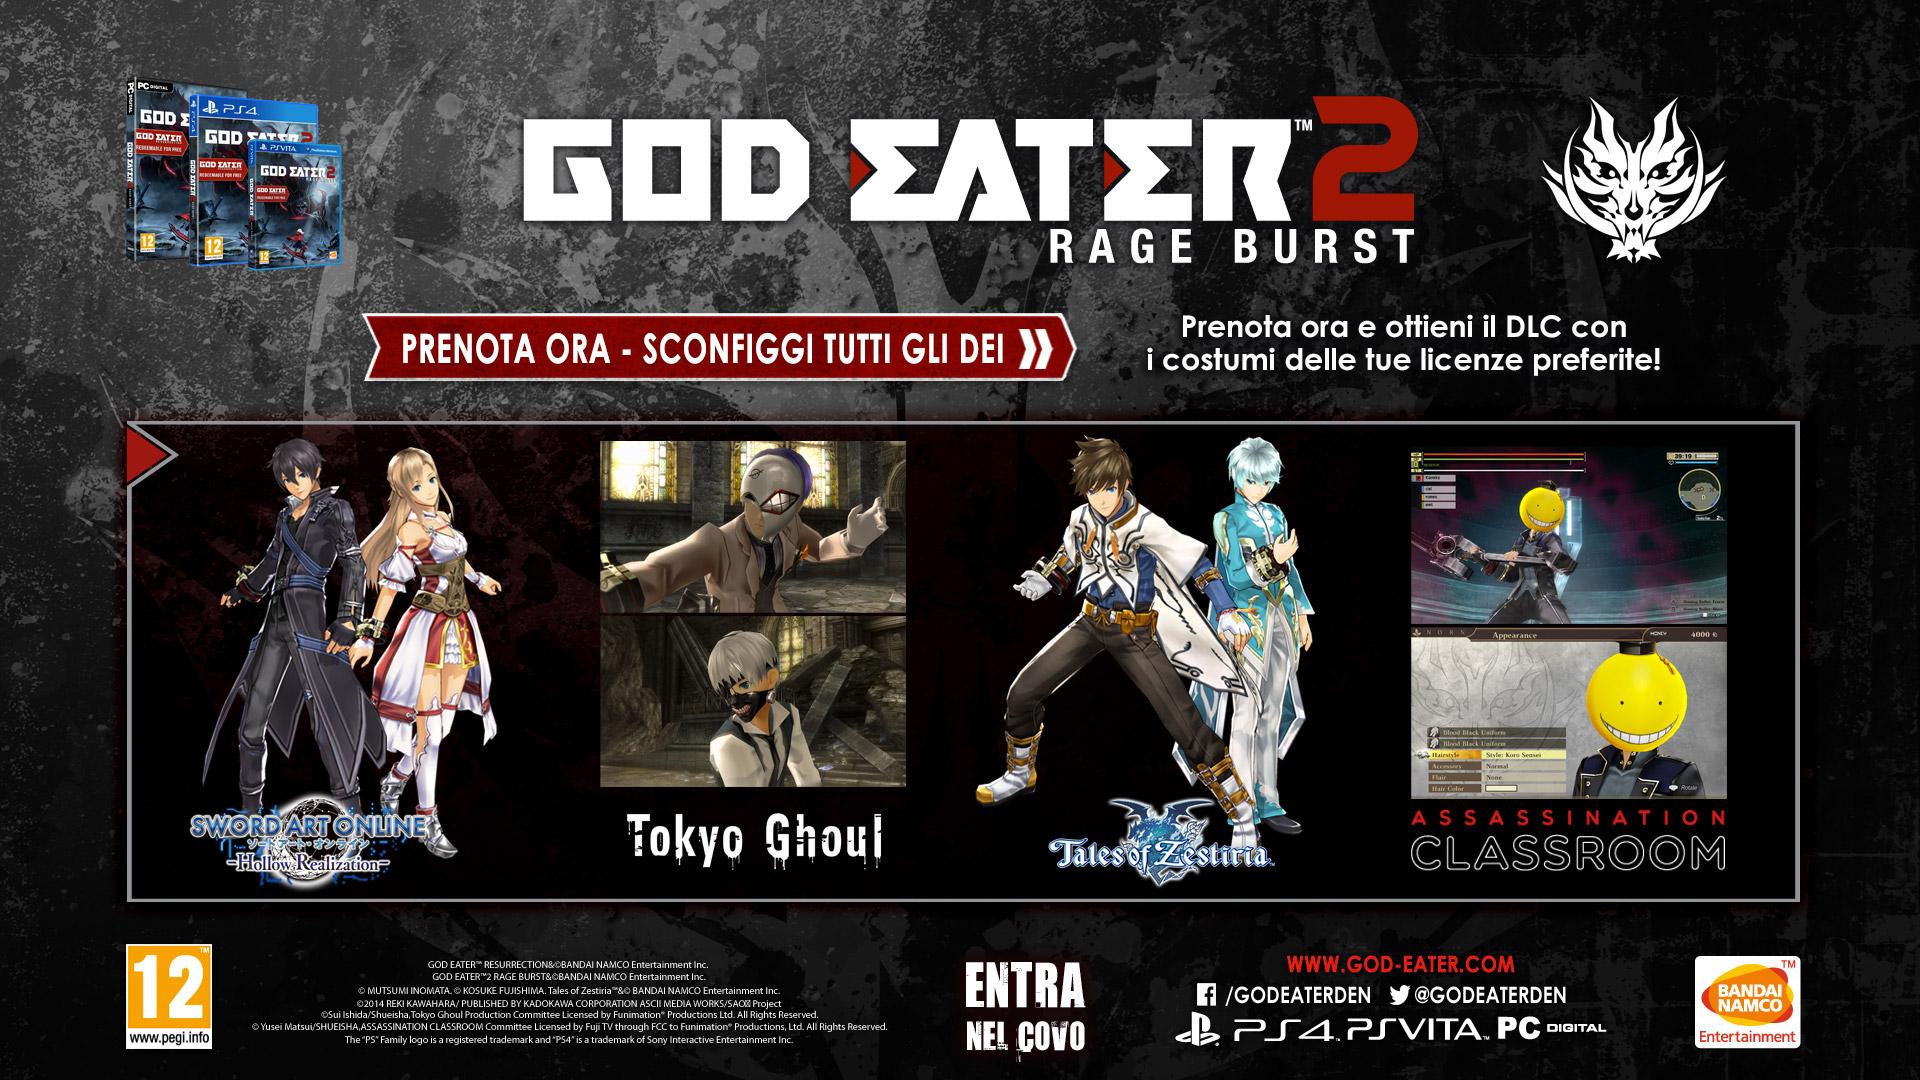 god-eater-2-rage-burst-dlc-europei